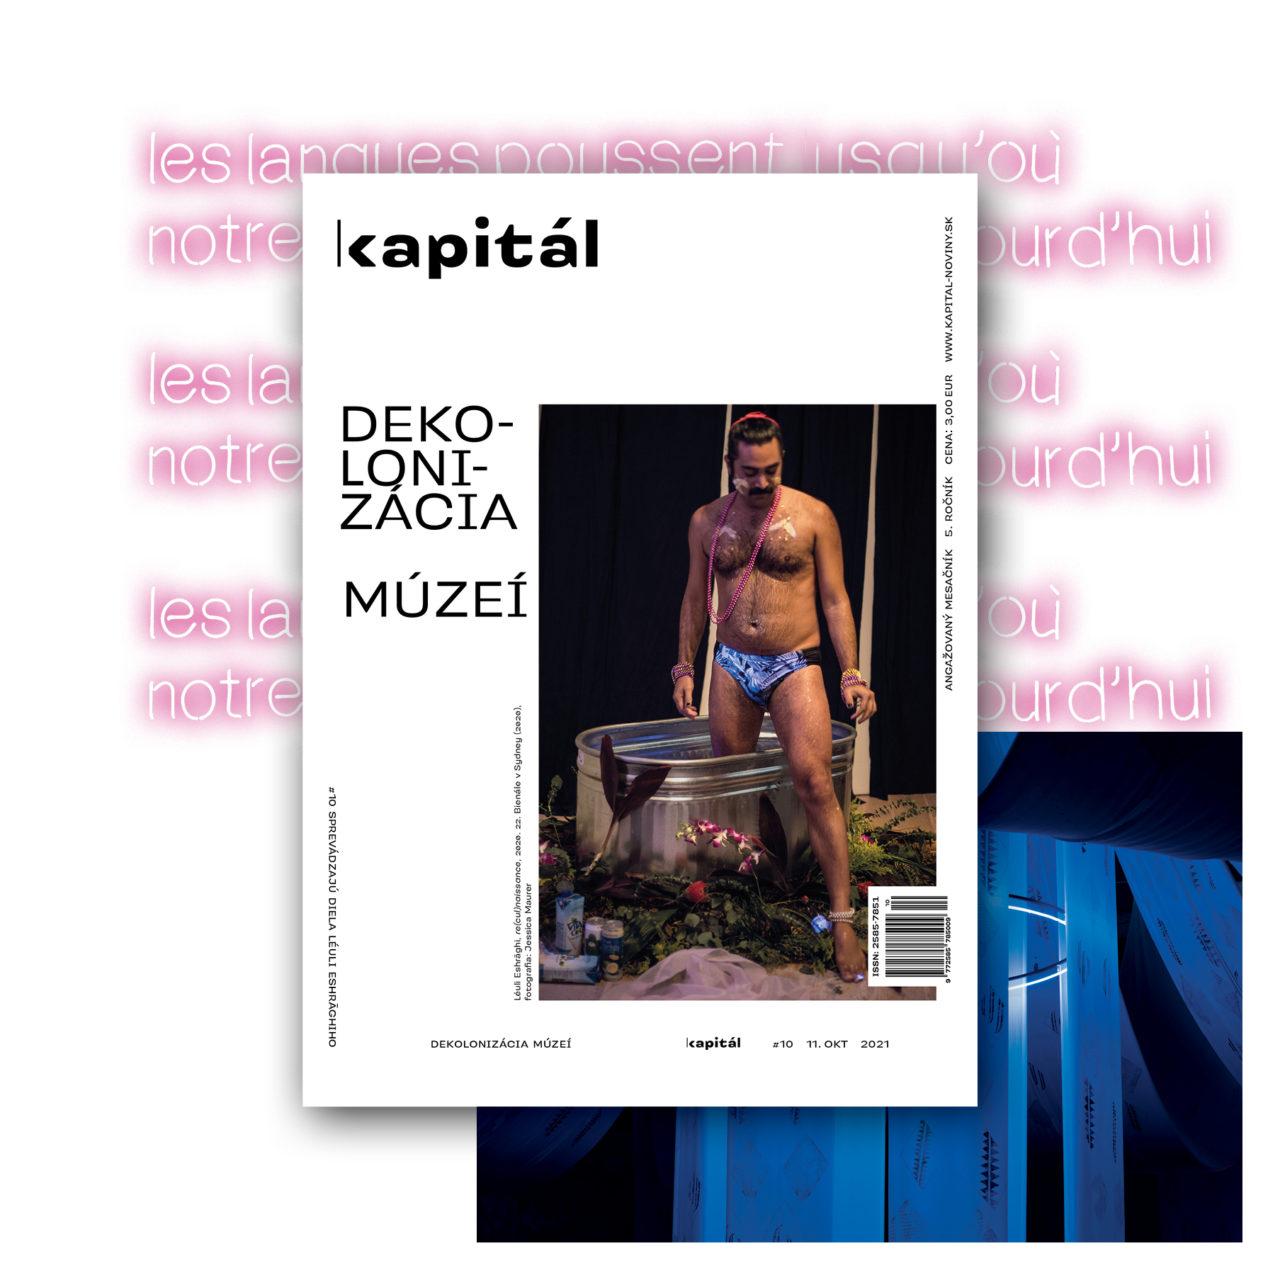 https://kapital-noviny.sk/wp-content/uploads/2021/10/2110_KAPITAL_10_DEKOLONIZACIA-MUZEI_WEB_PROFILOVKA-1280x1280.jpg